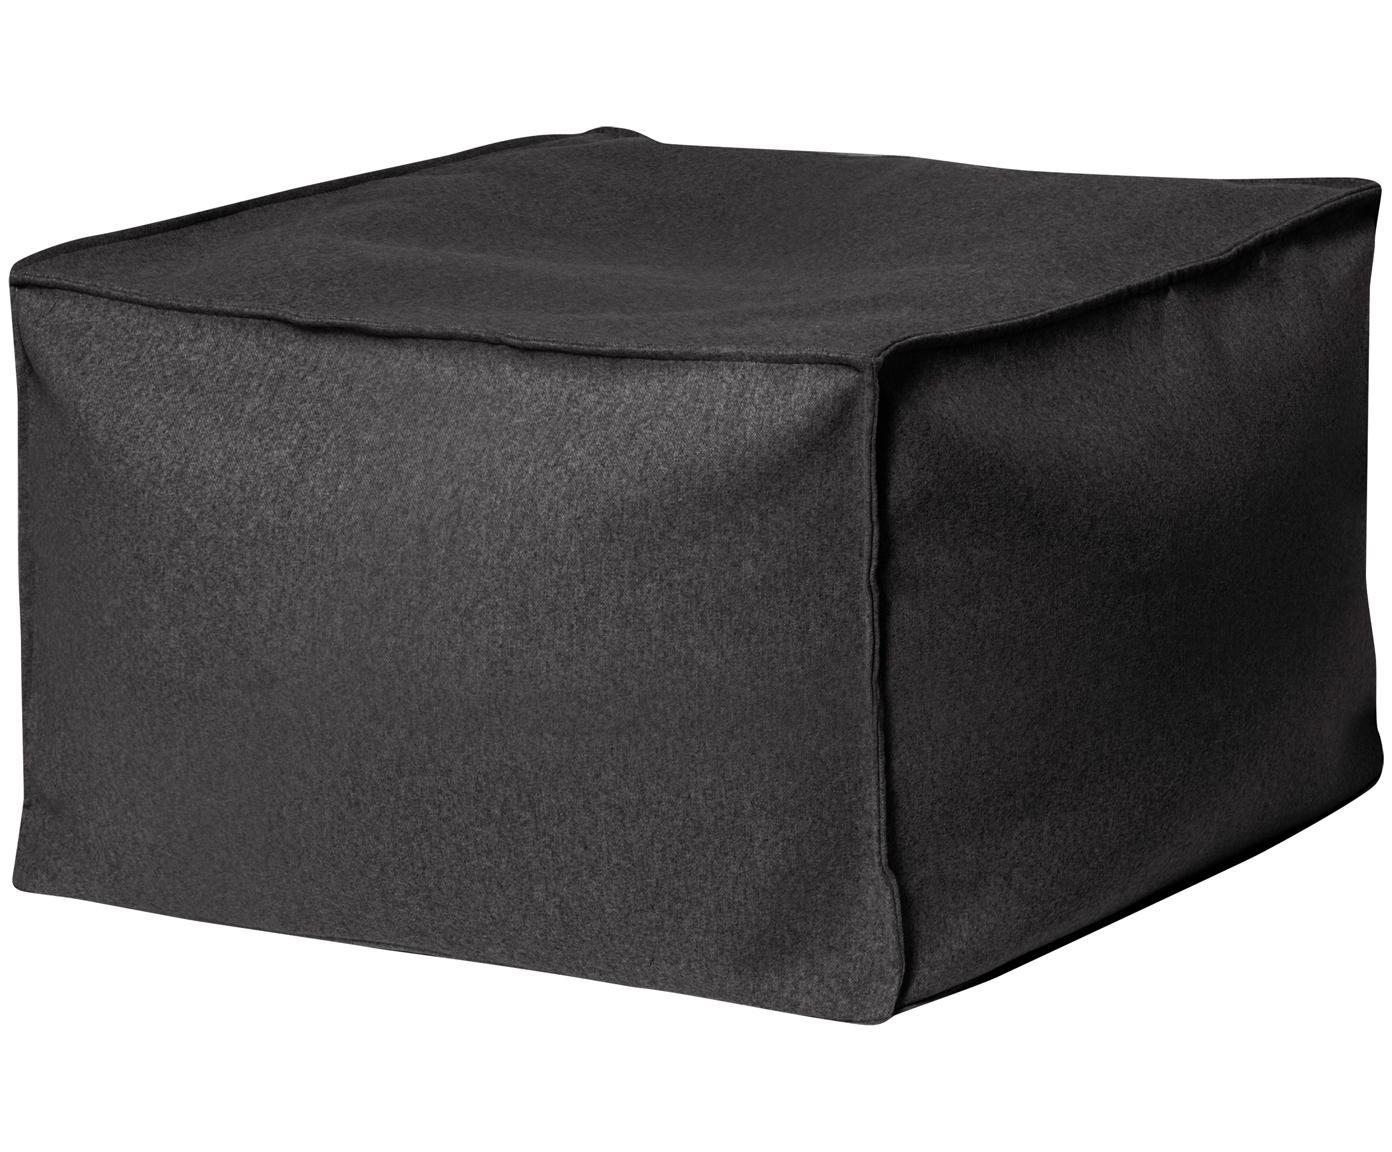 Vilten zitzak Loft, Bekleding: polyester, Antraciet, 60 x 45 cm